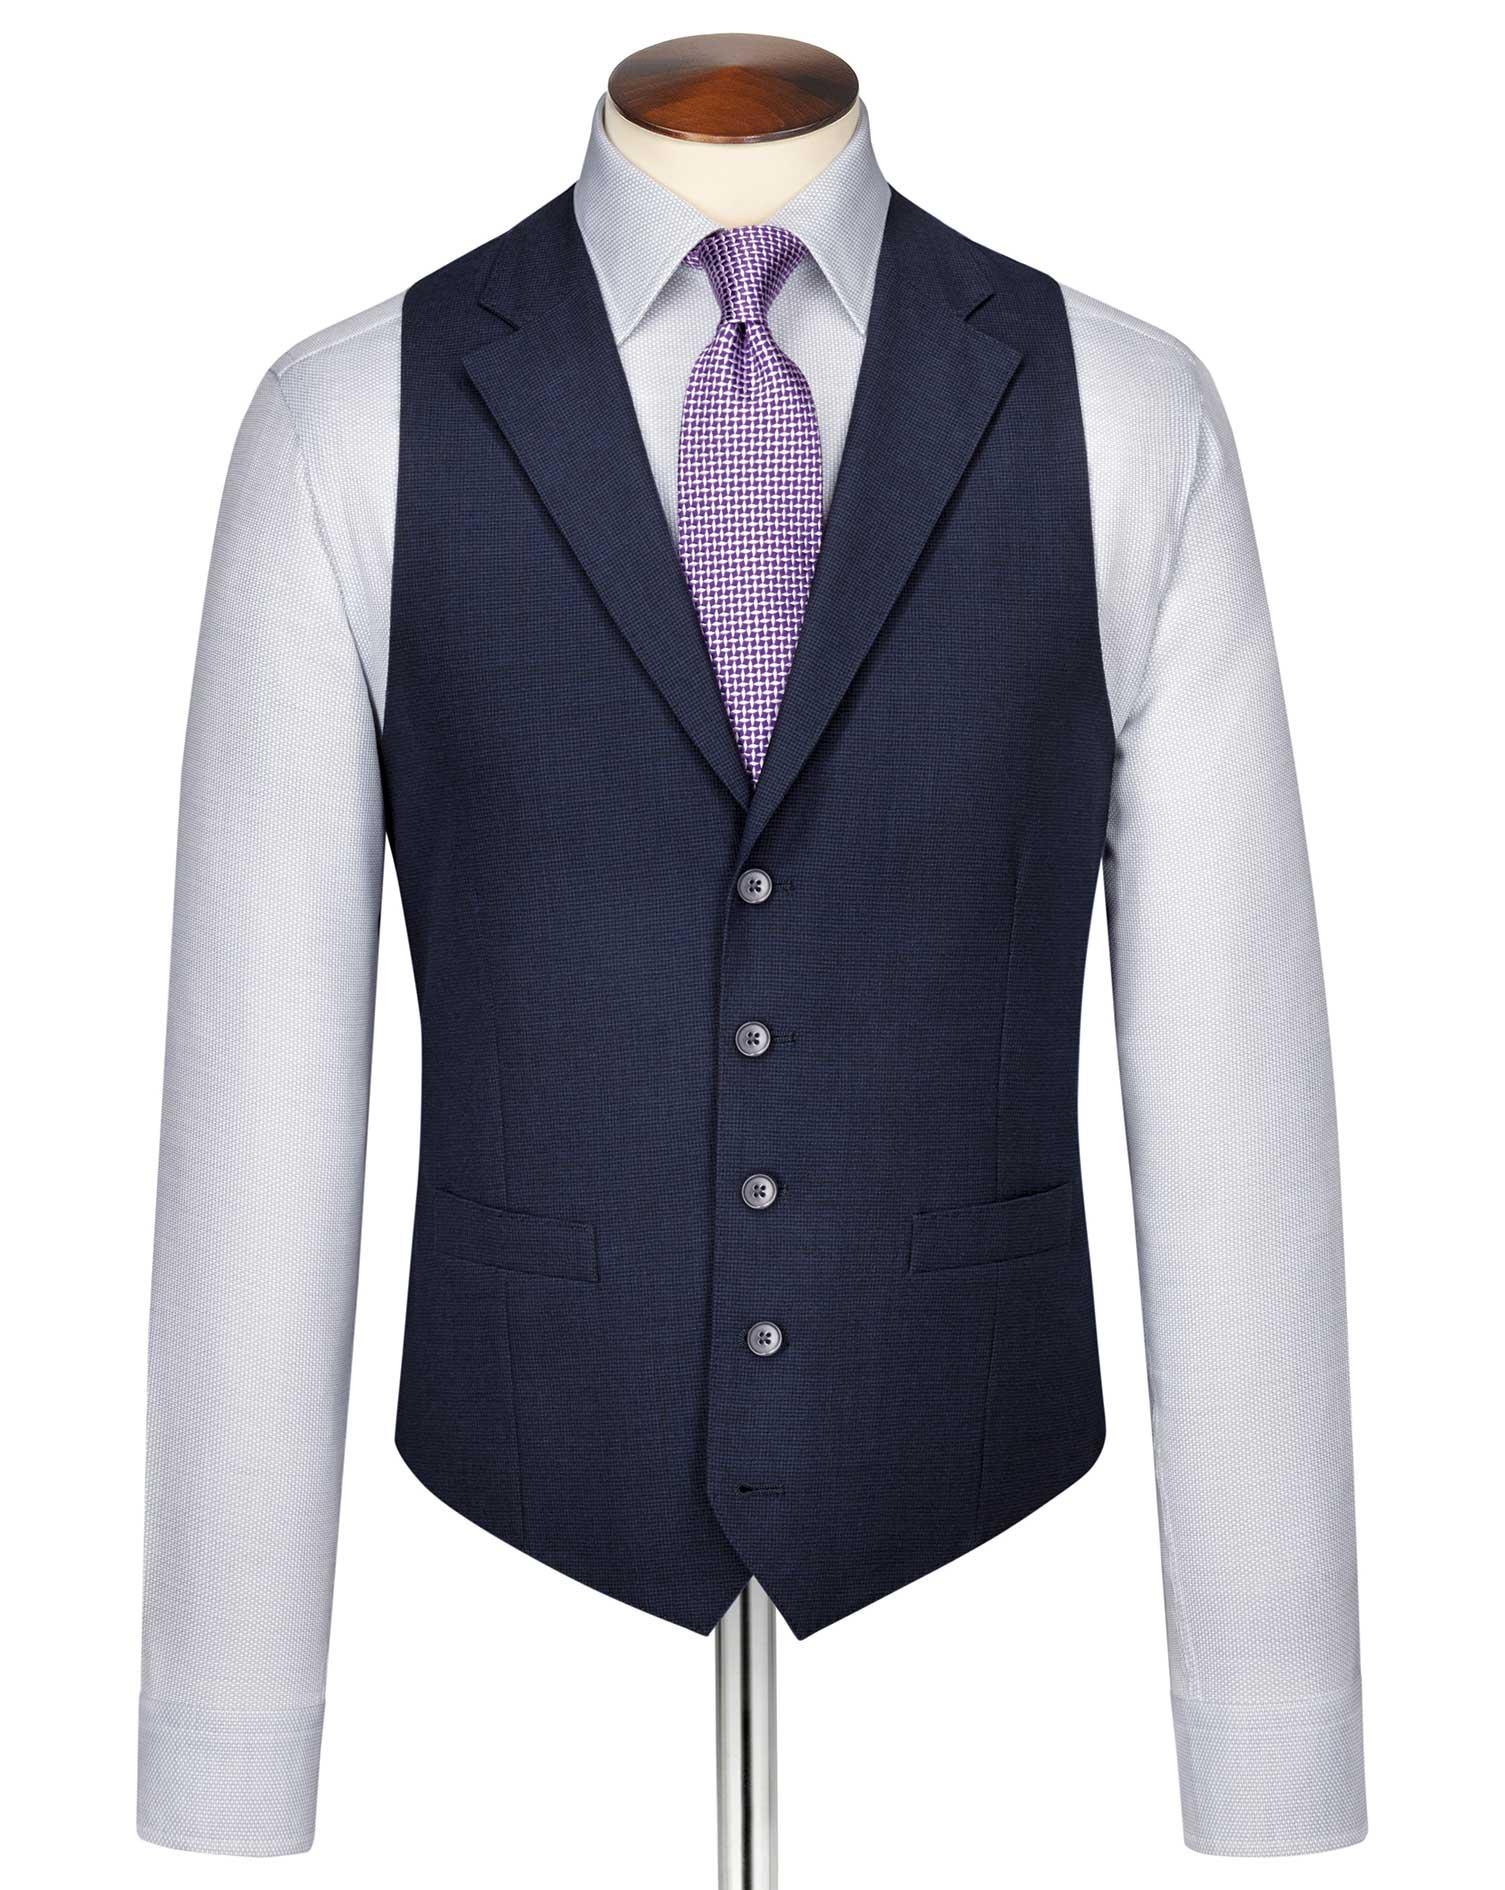 Indigo Blue Puppytooth Panama Business Suit Wool Waistcoat Size w42 by Charles Tyrwhitt